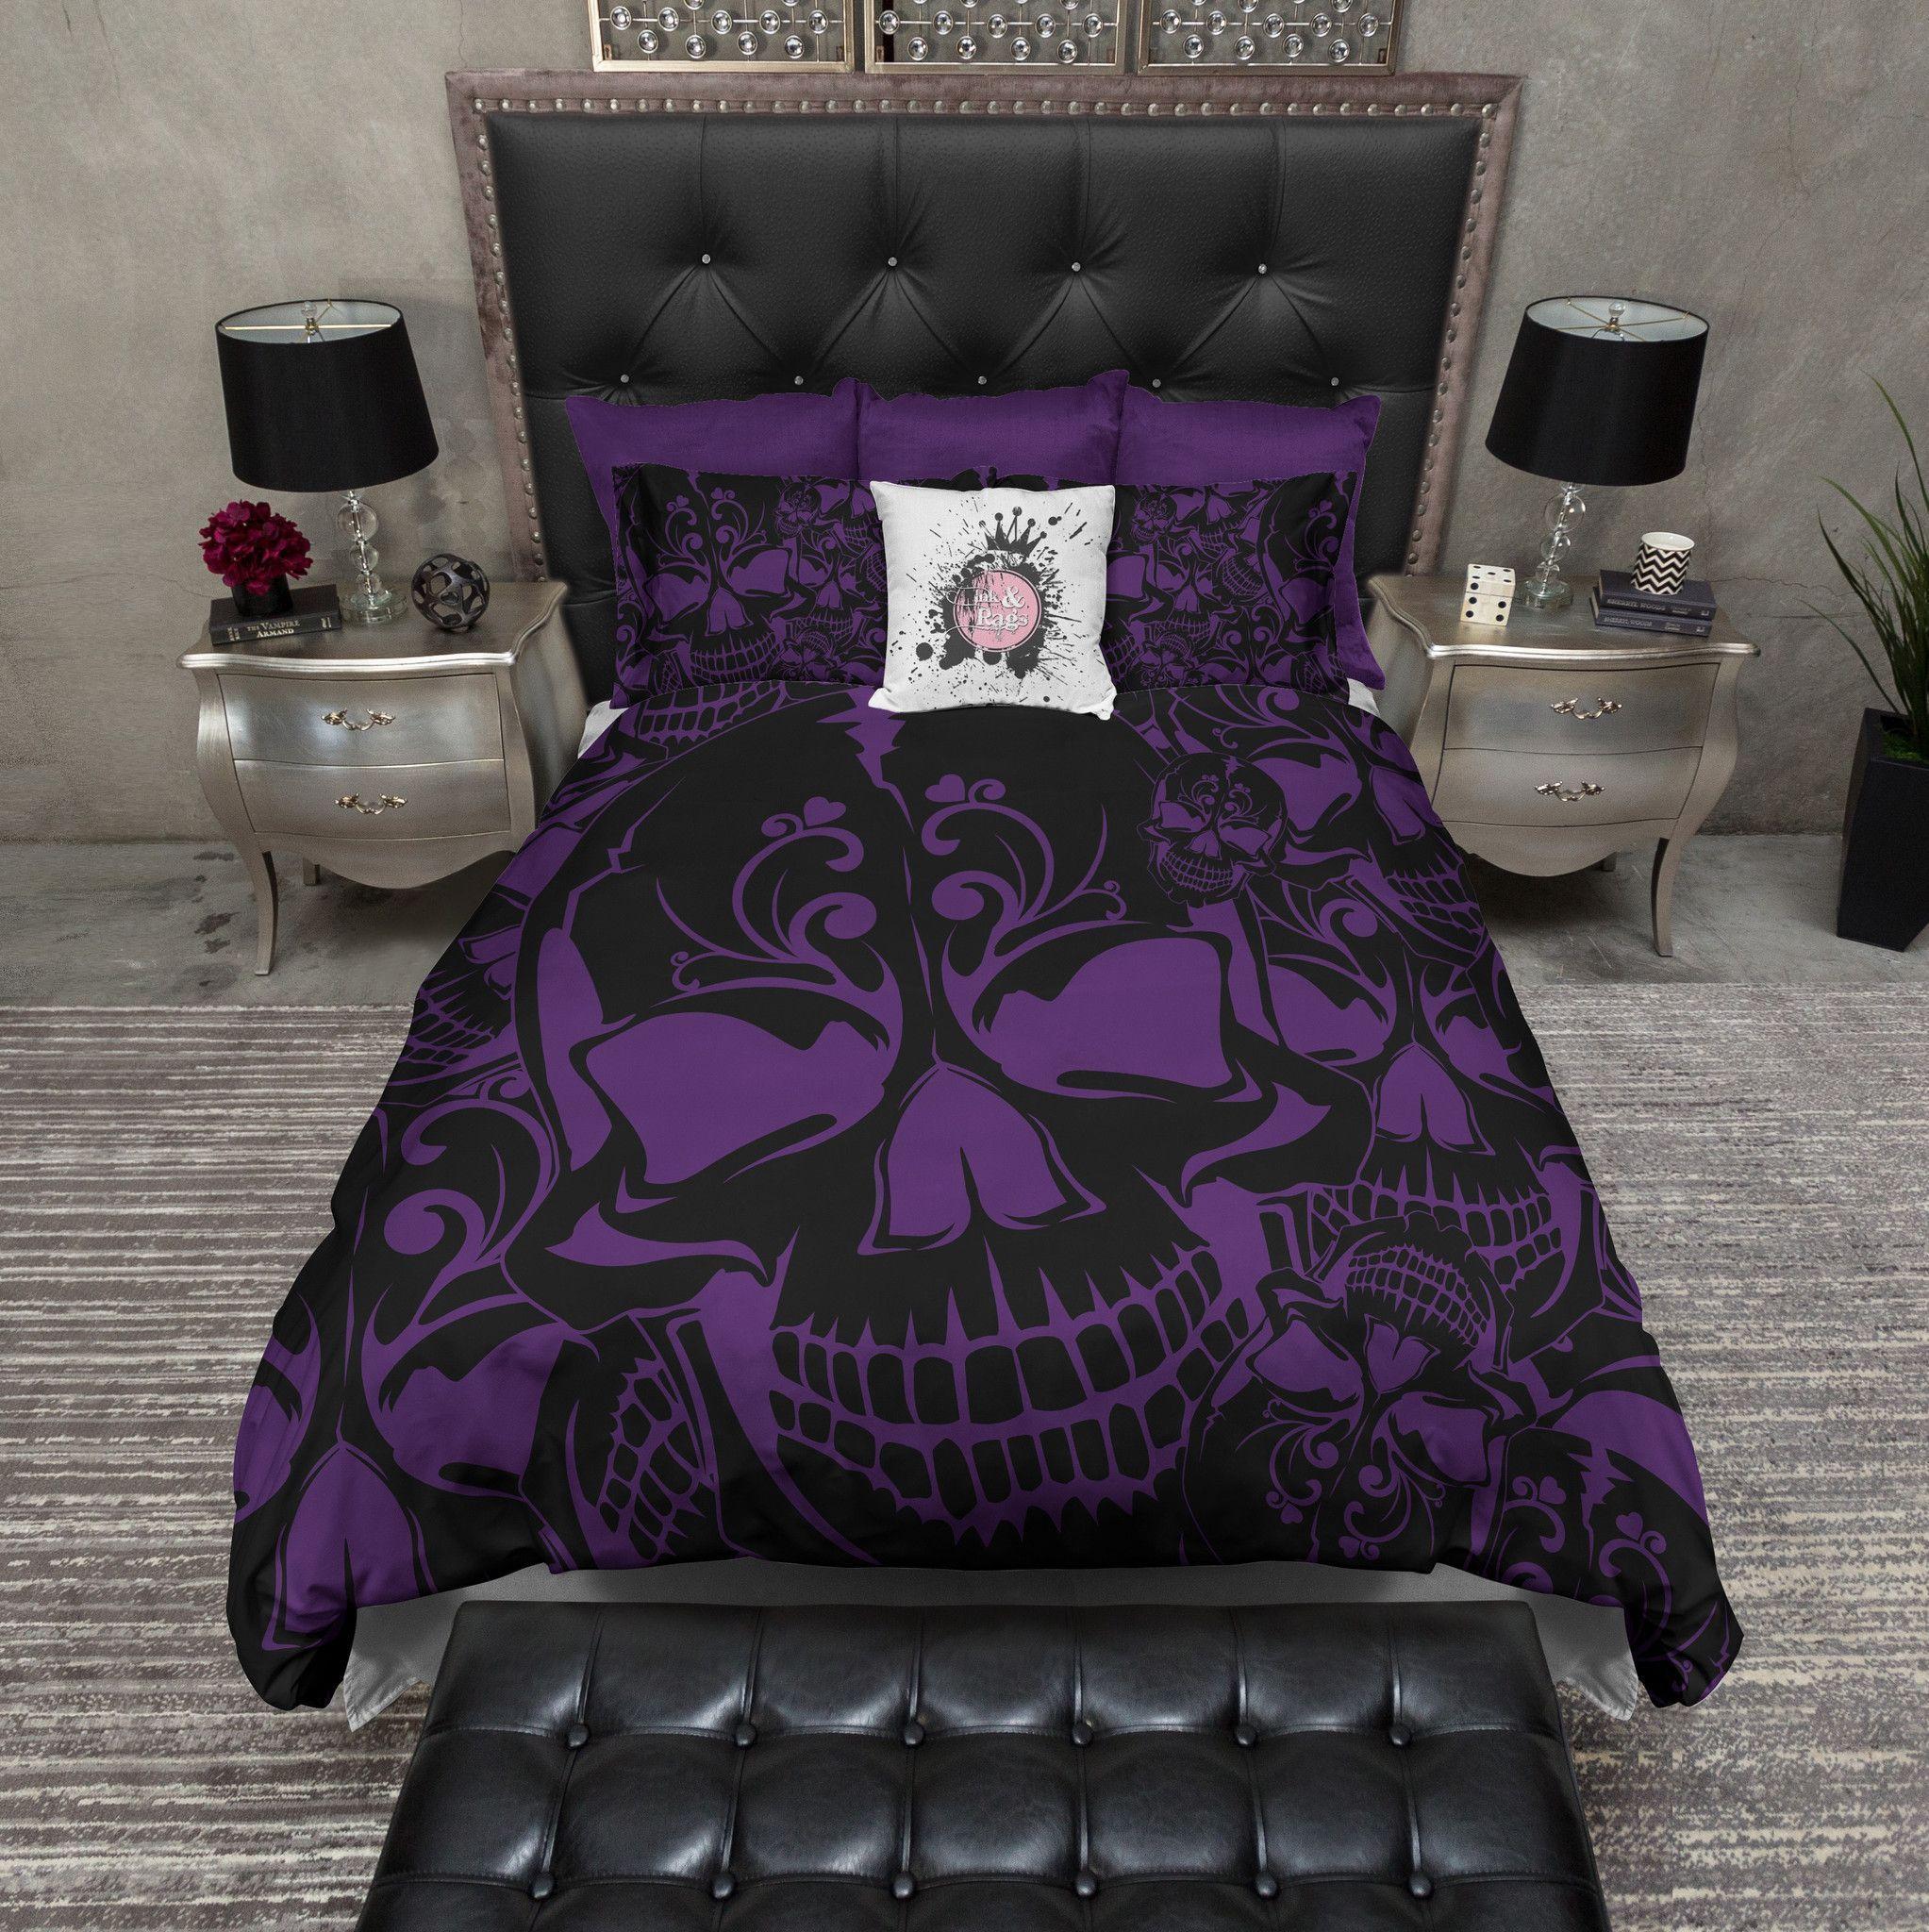 Purple And Black Collage Skull Duvet Bedding Sets #Luxurybeddingblack #Luxurybeddingpurple